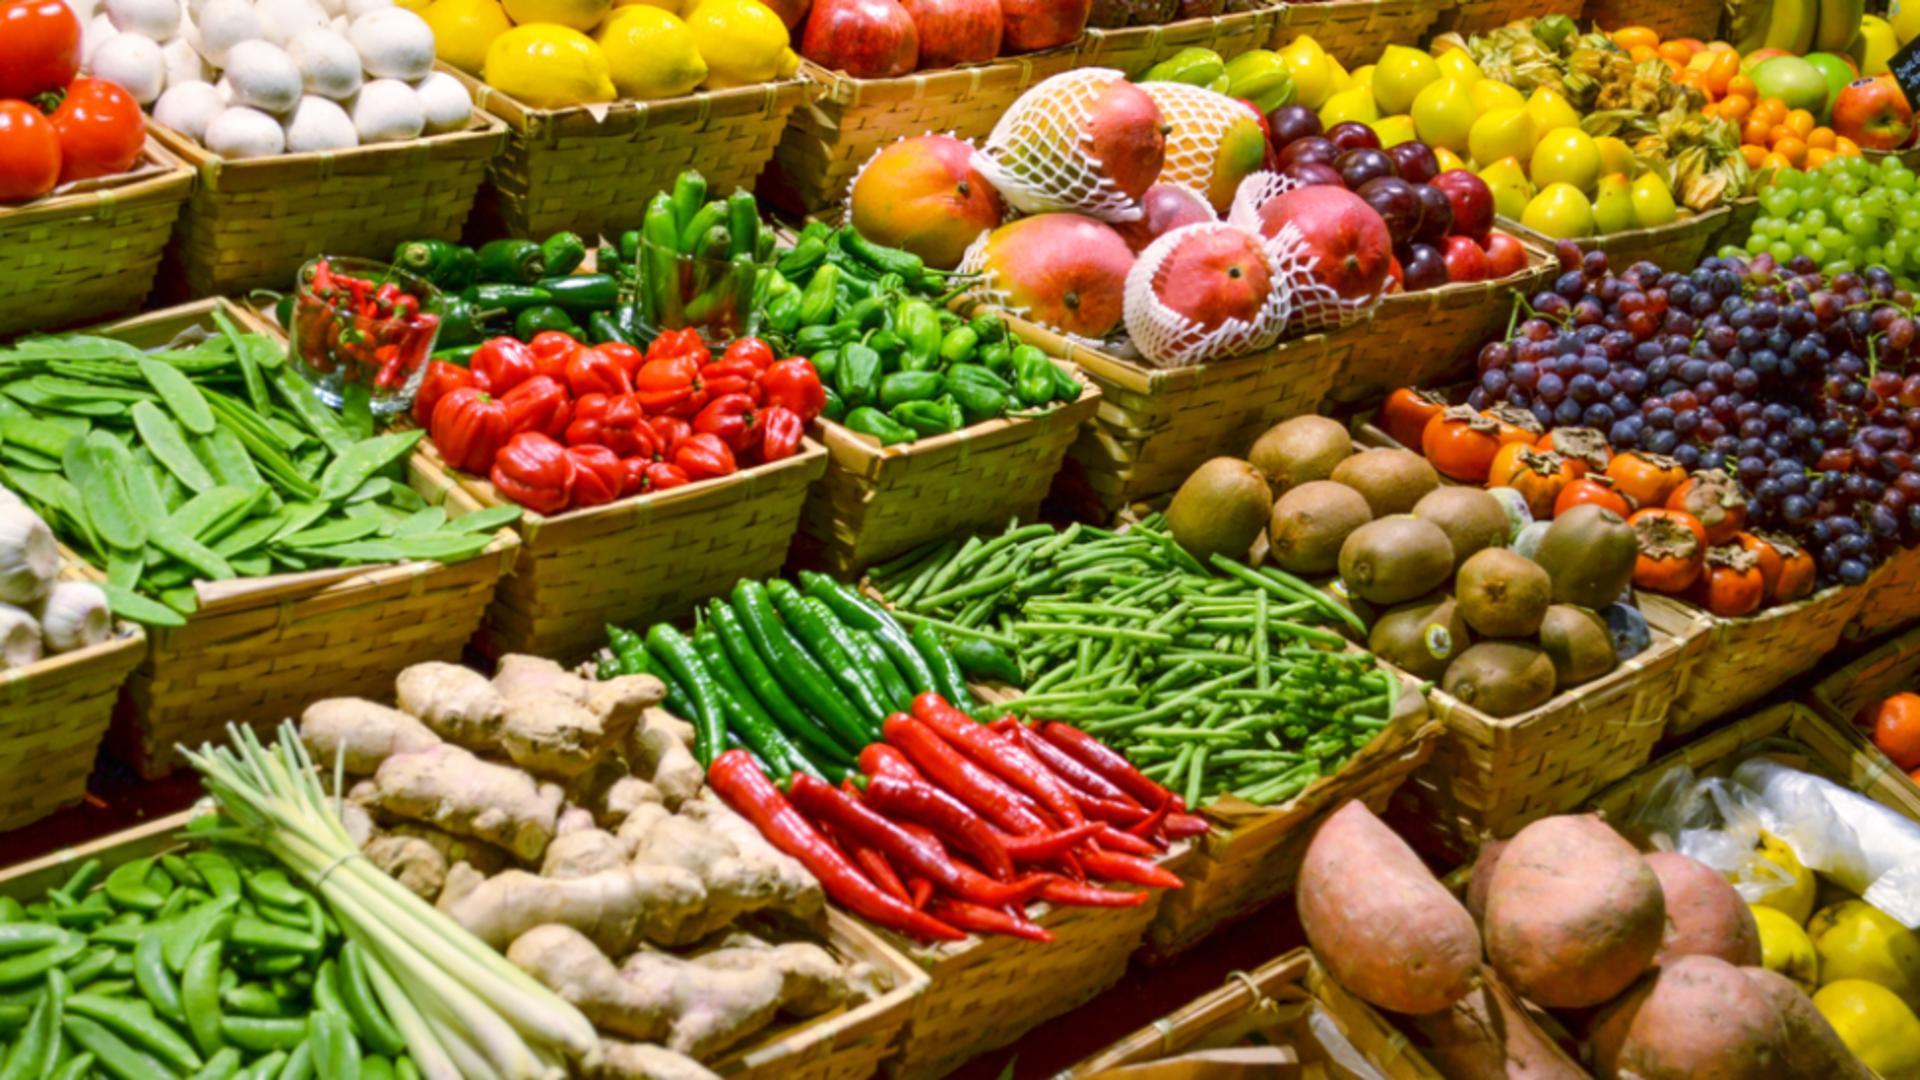 Stand de fructe și legume (foto ilustrativ)